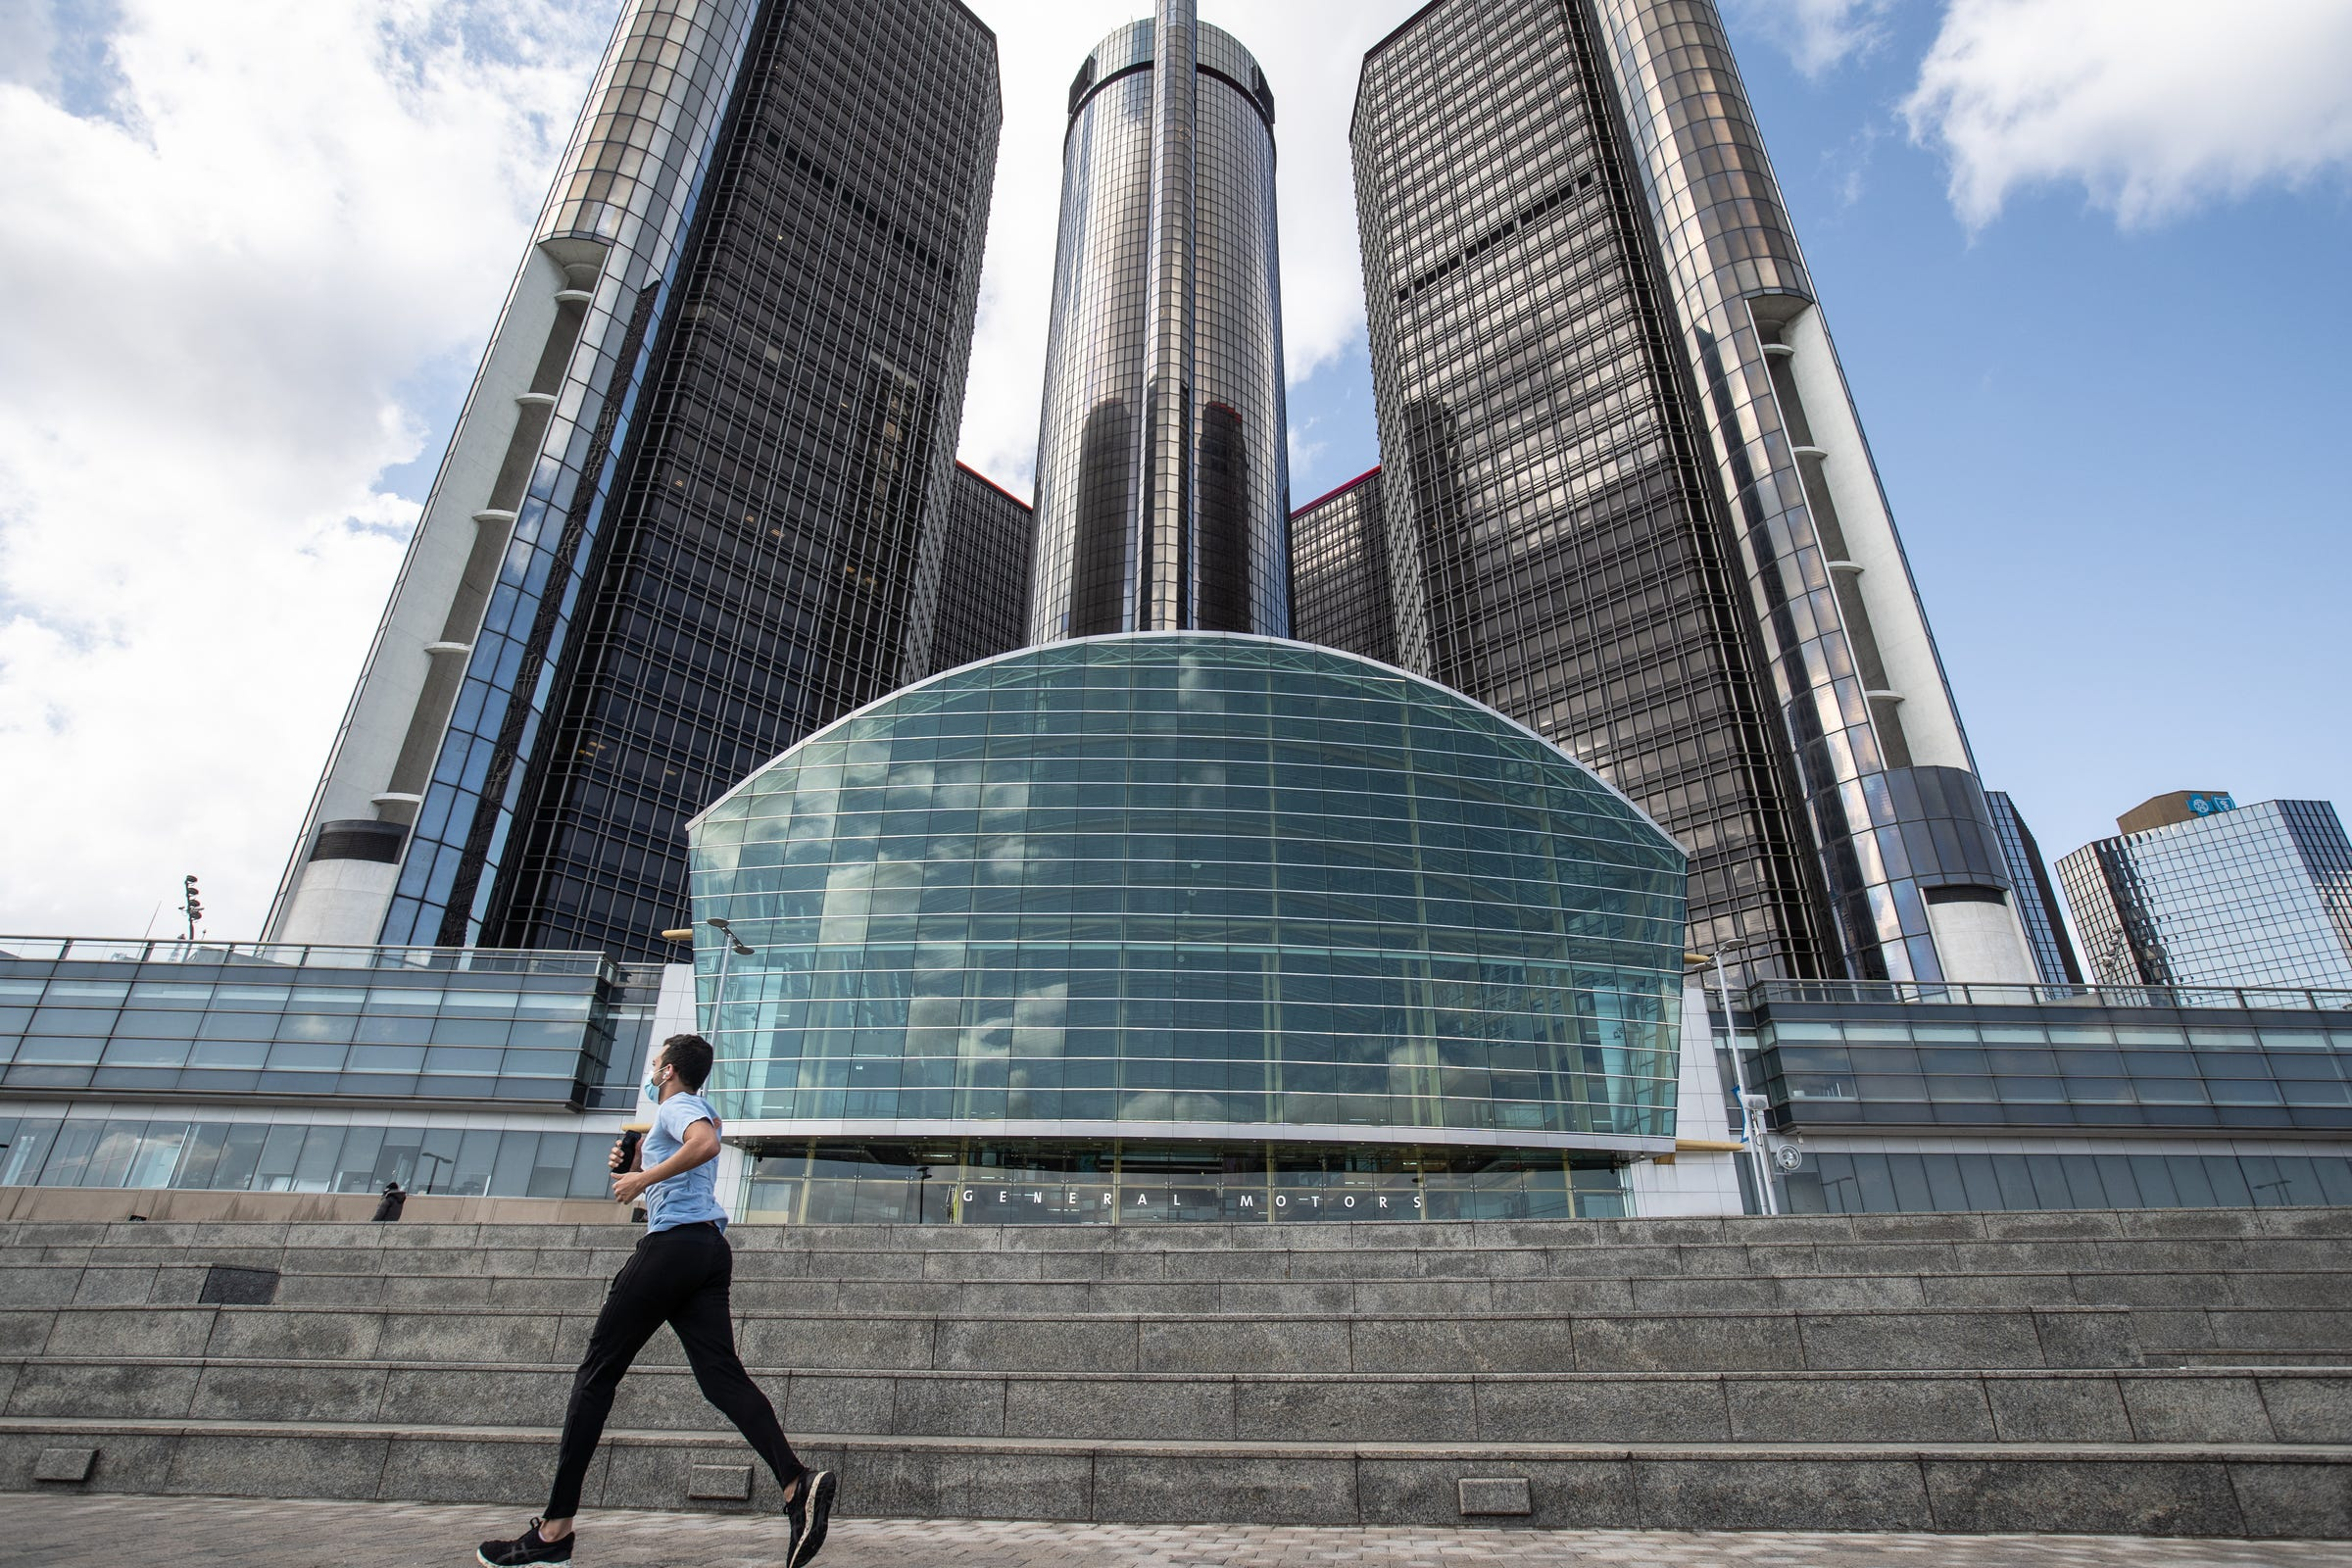 GM reports $3.3B first-quarter net profit despite semiconductor chip shortage